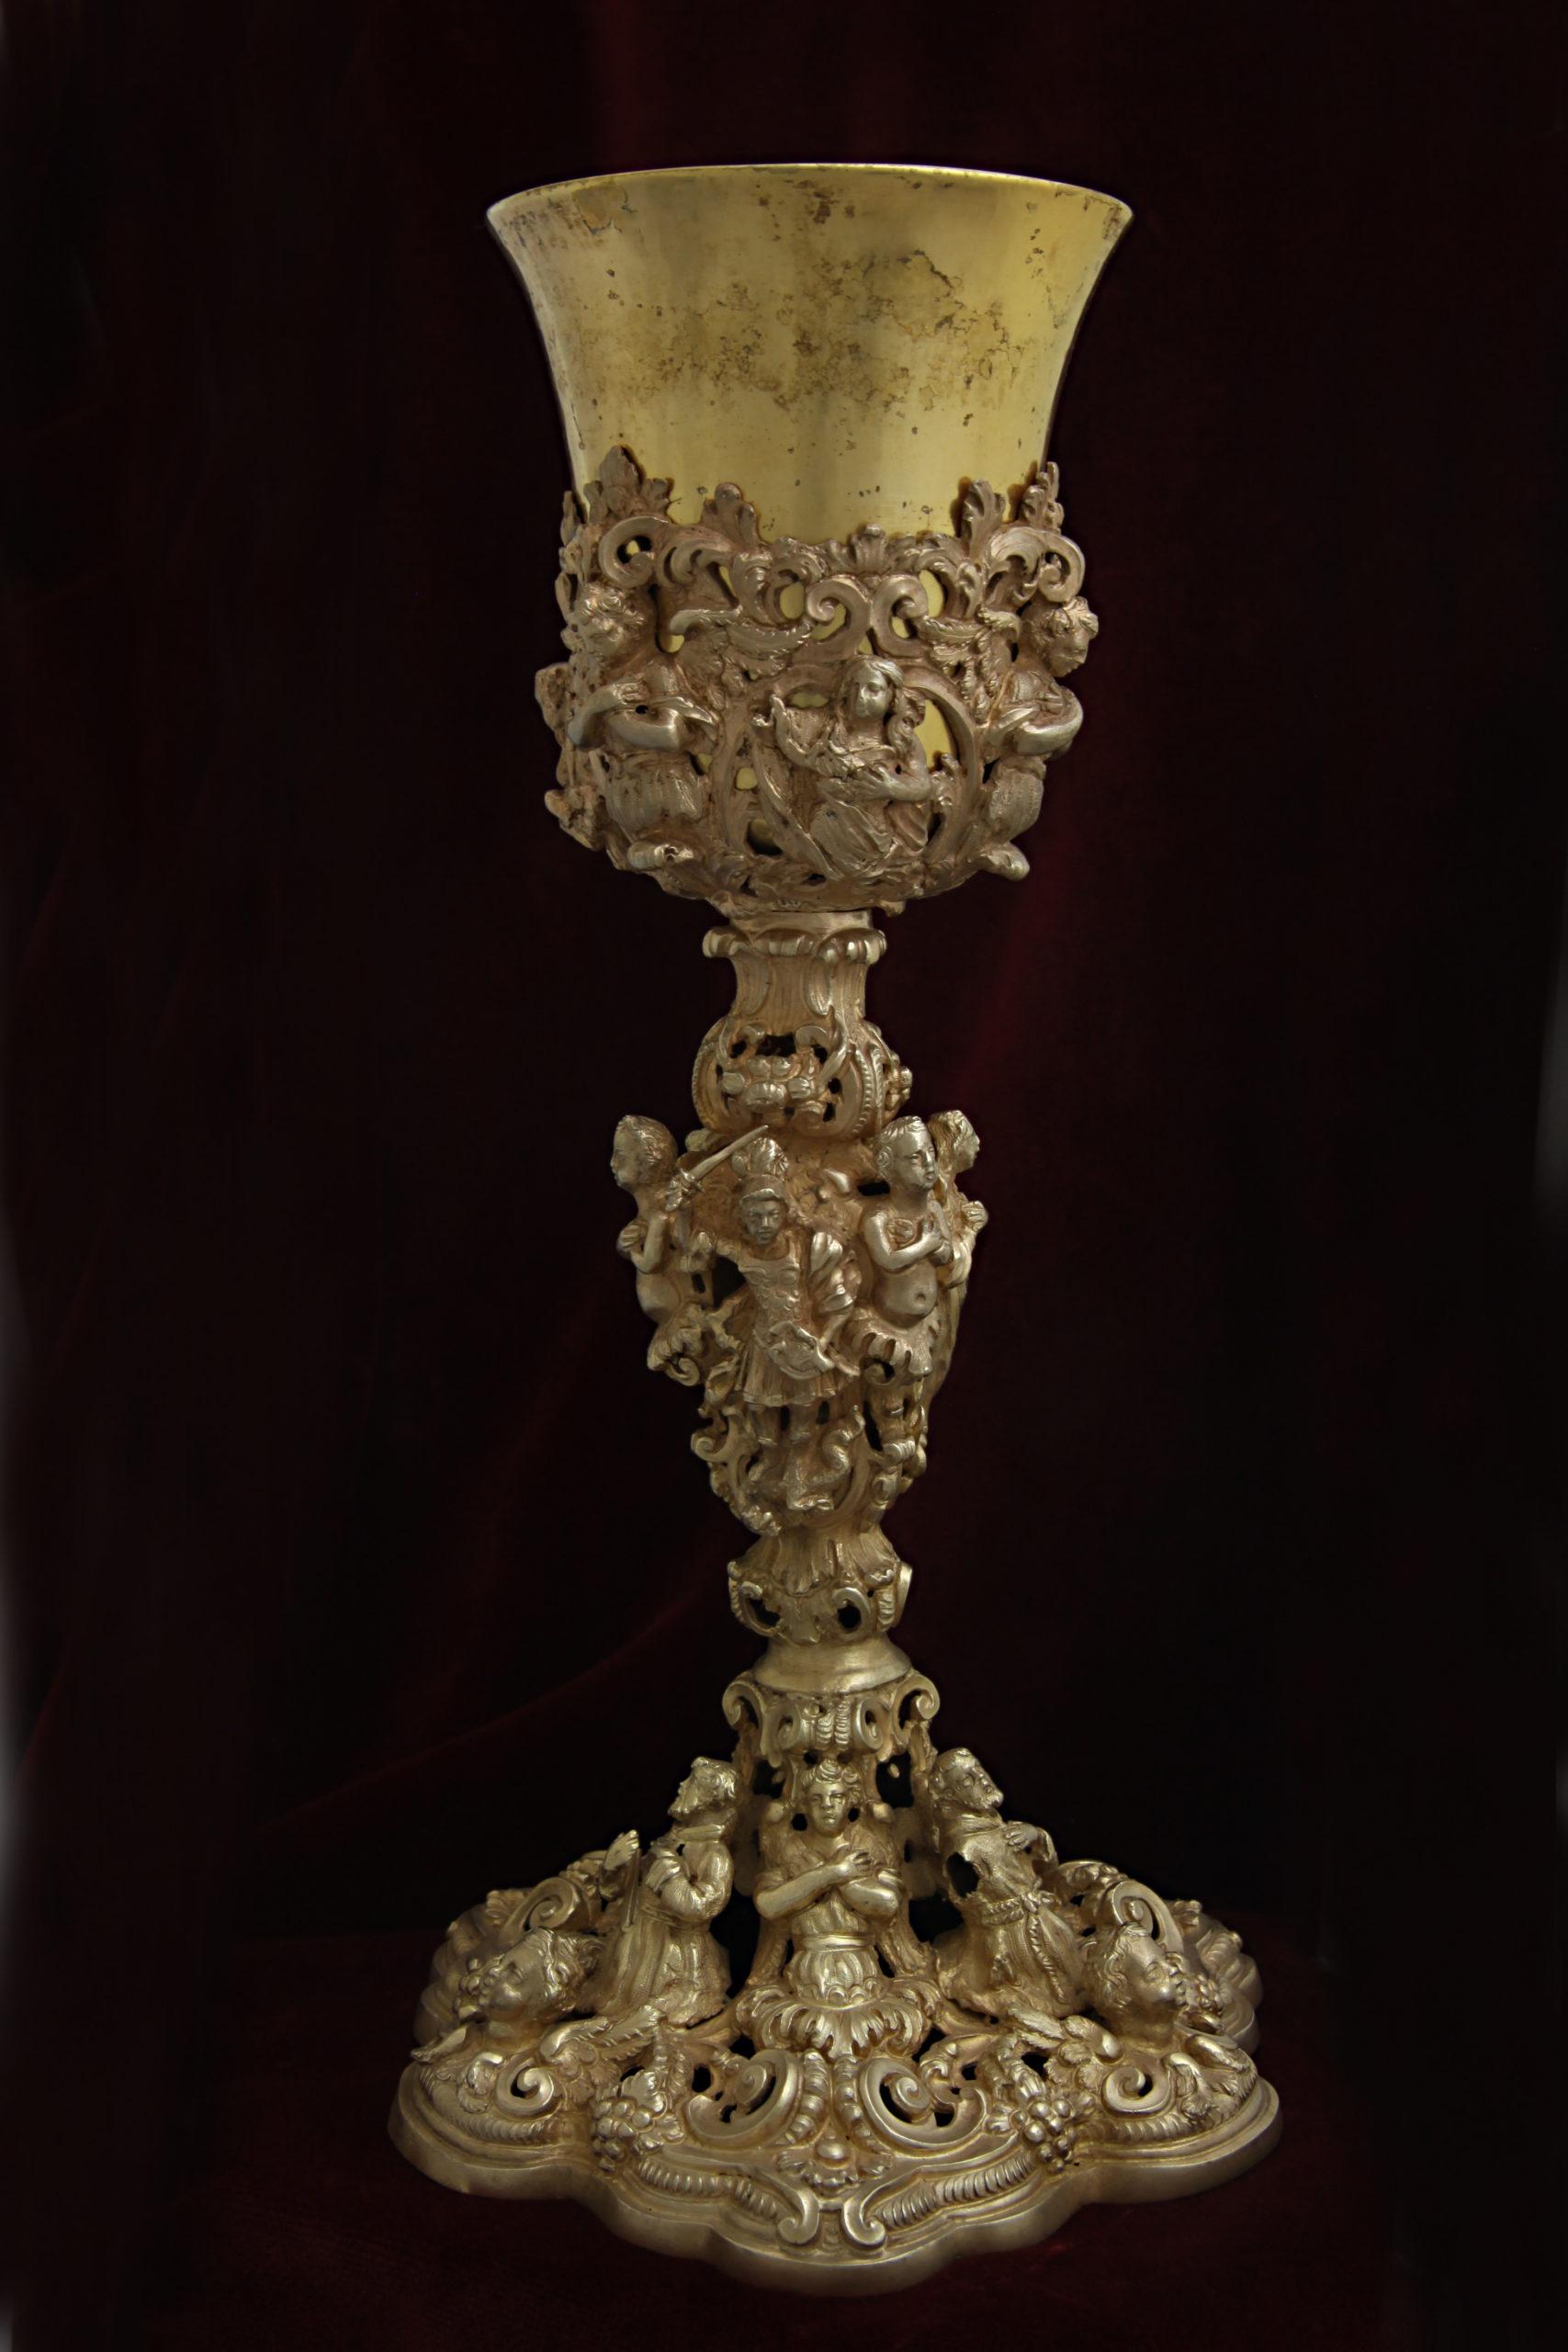 66-Calice-argento-Napoli-Sec.-XVIII-scaled